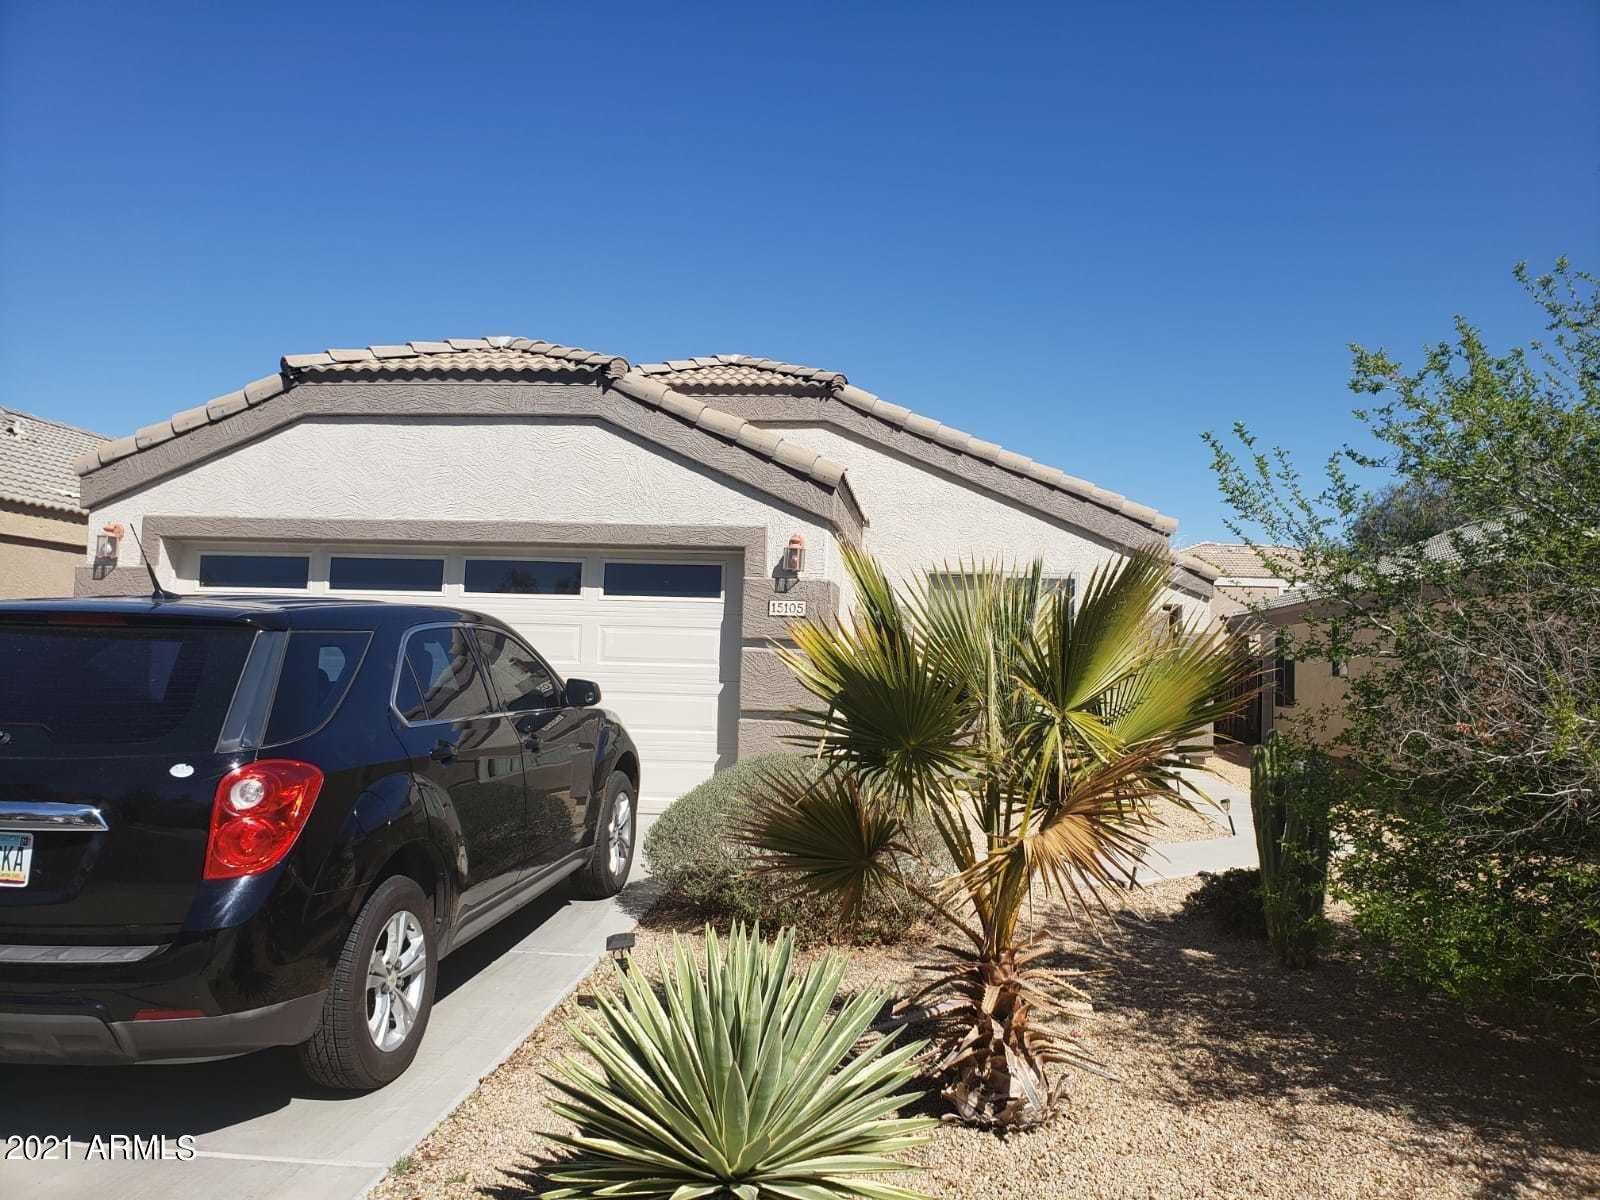 Photo of 15105 N VERBENA Street, El Mirage, AZ 85335 (MLS # 6199518)